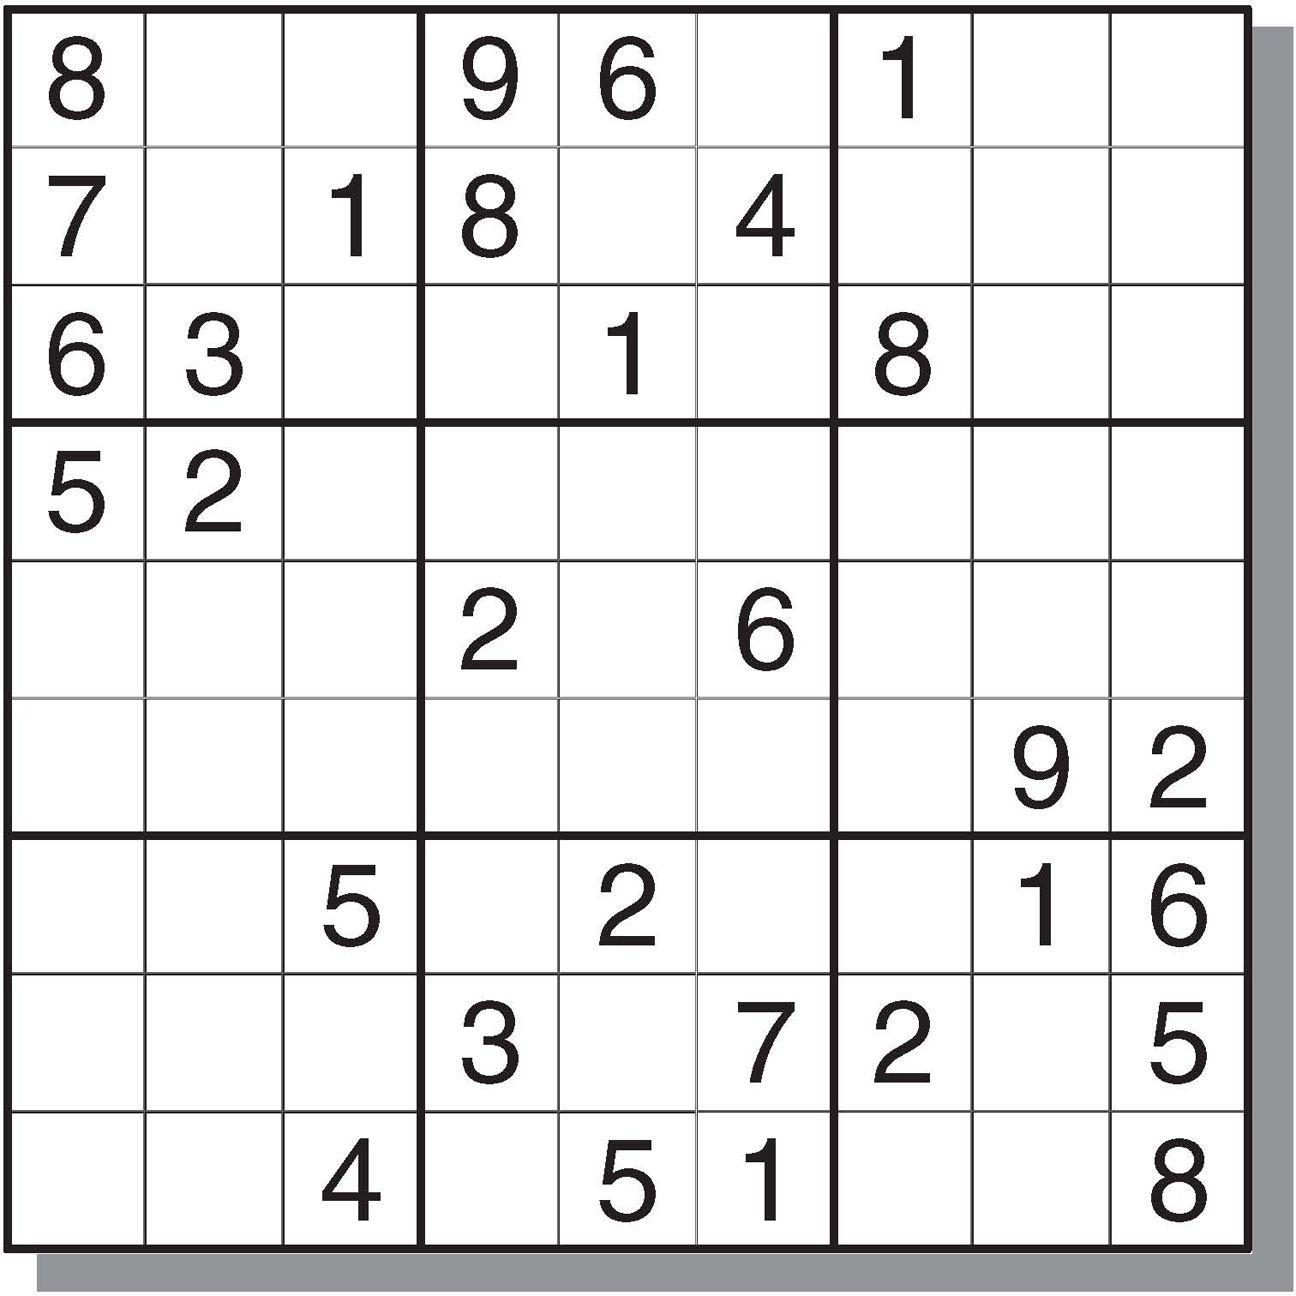 Printable Sudoku Puzzles Krazydad | Printable Crossword ...